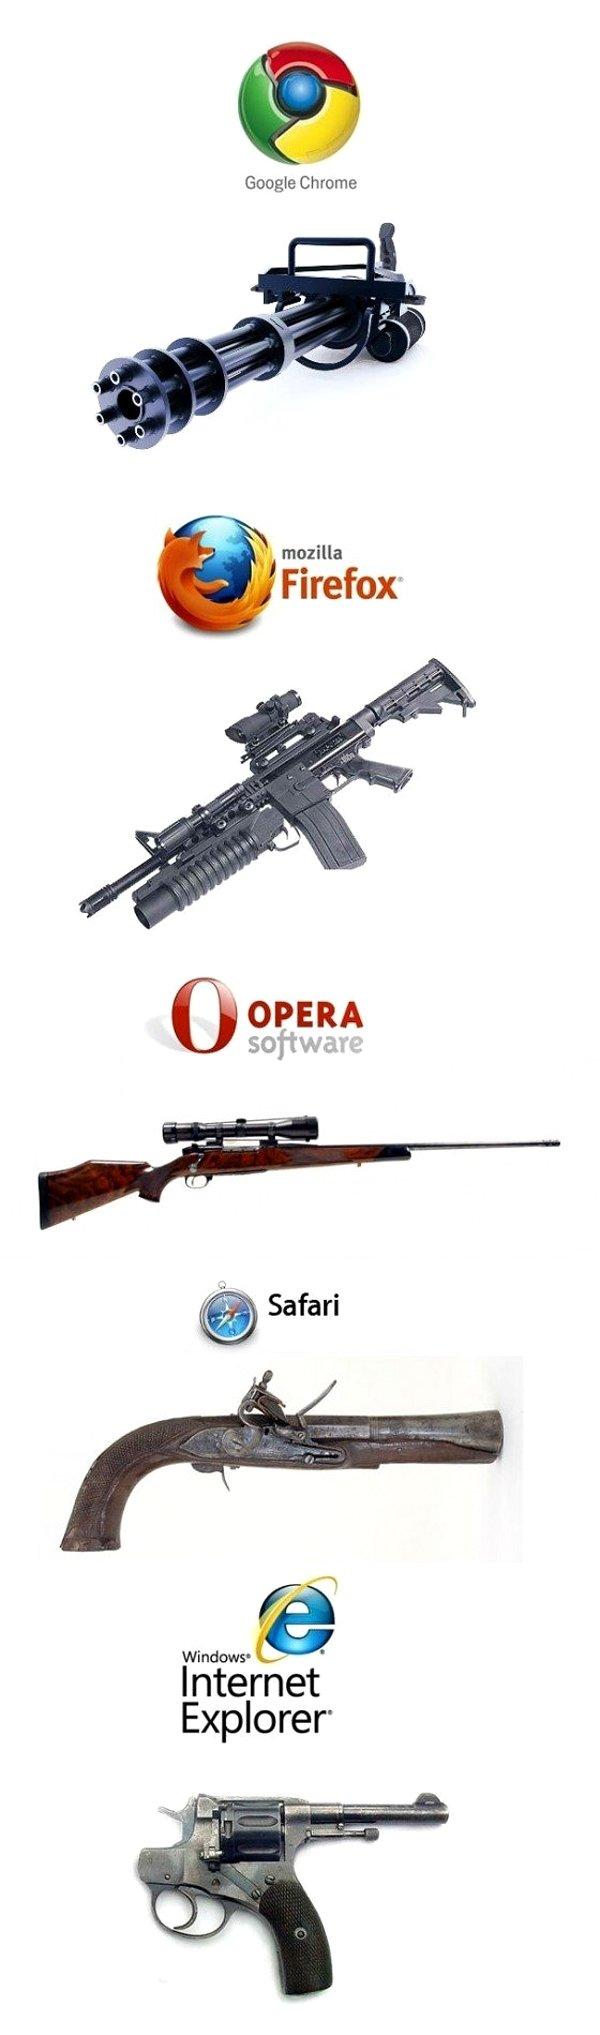 browsers-as-guns.jpg